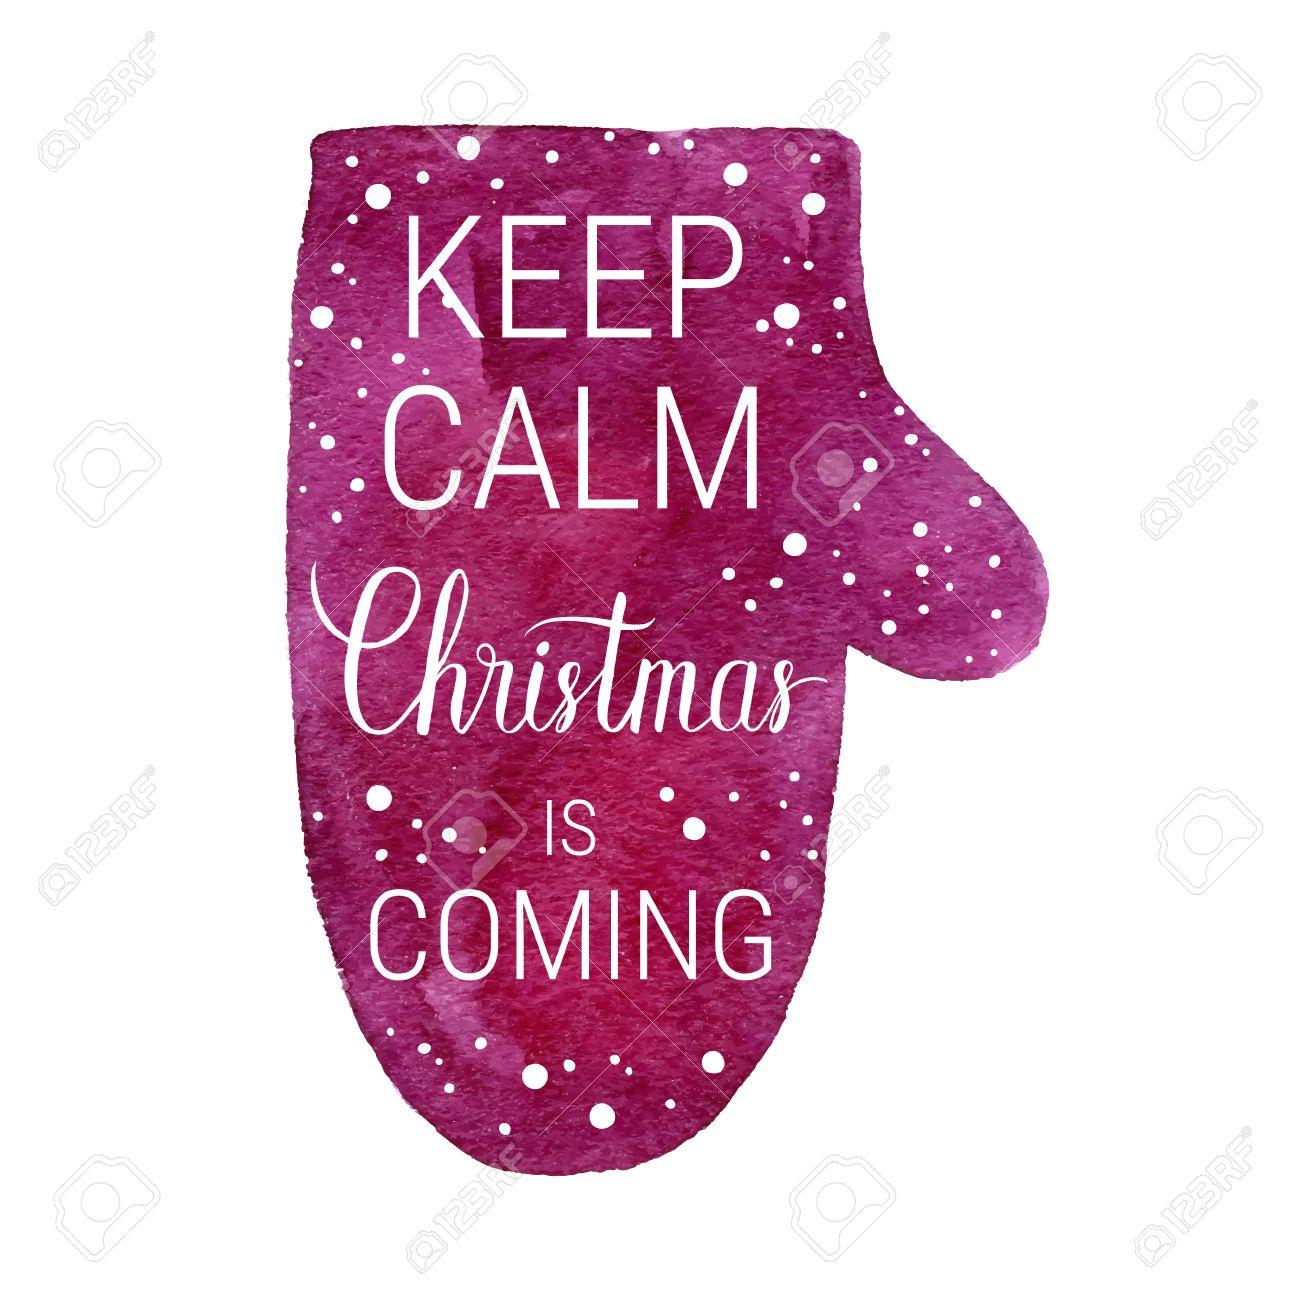 Keep Calm Christmas Is Coming.Keep Calm And Christmas Is Coming Poster Vector Winter Holidays